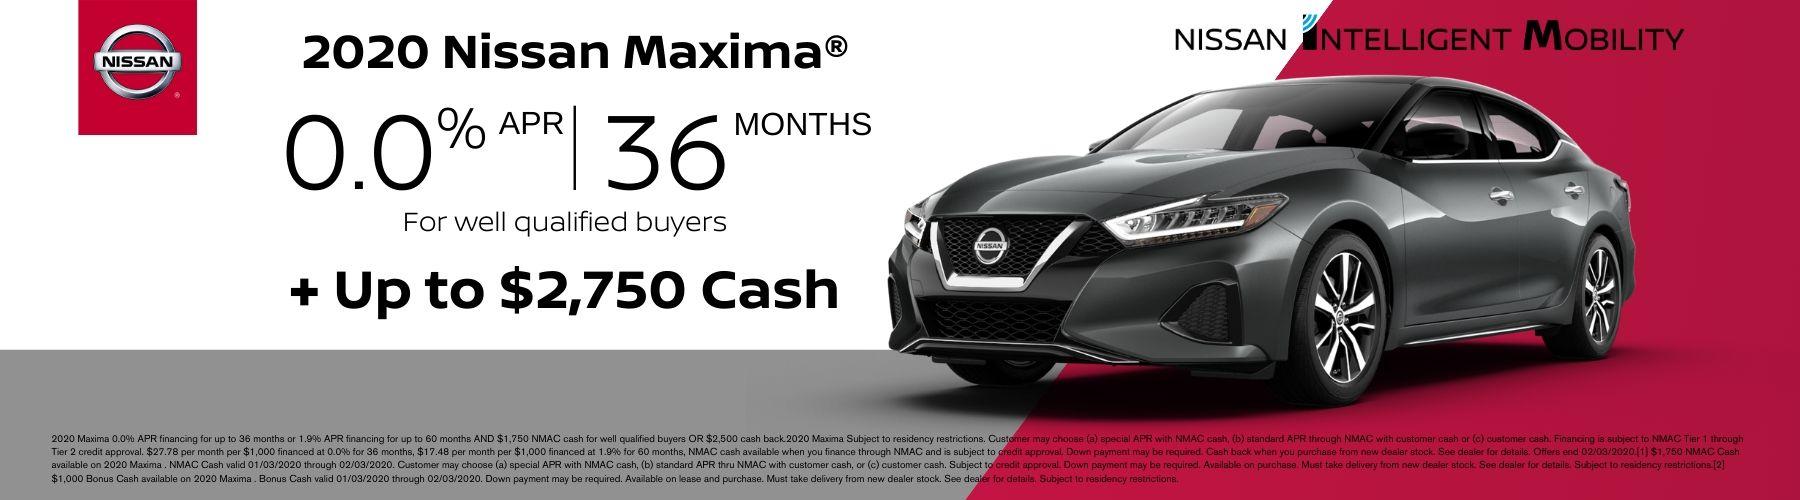 Maxima January Offer